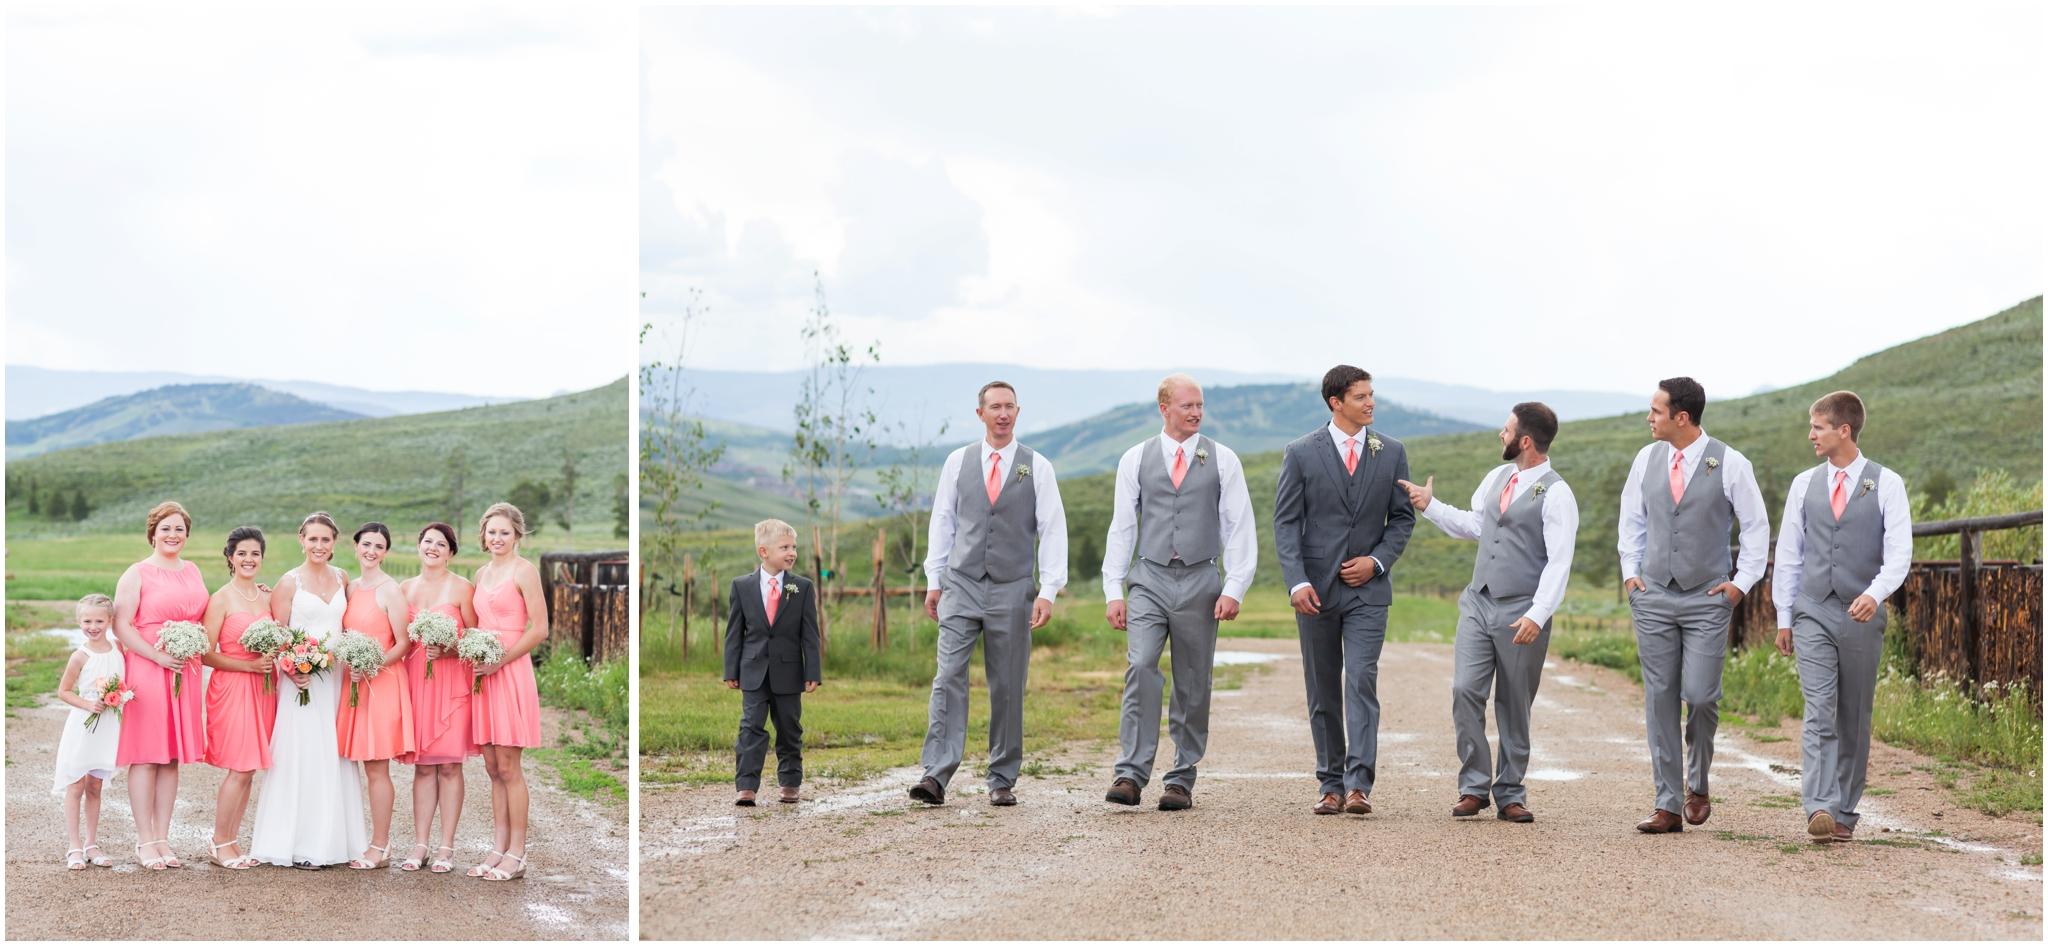 Strawberry_Creek_Ranch_Wedding_Photographer14.jpg